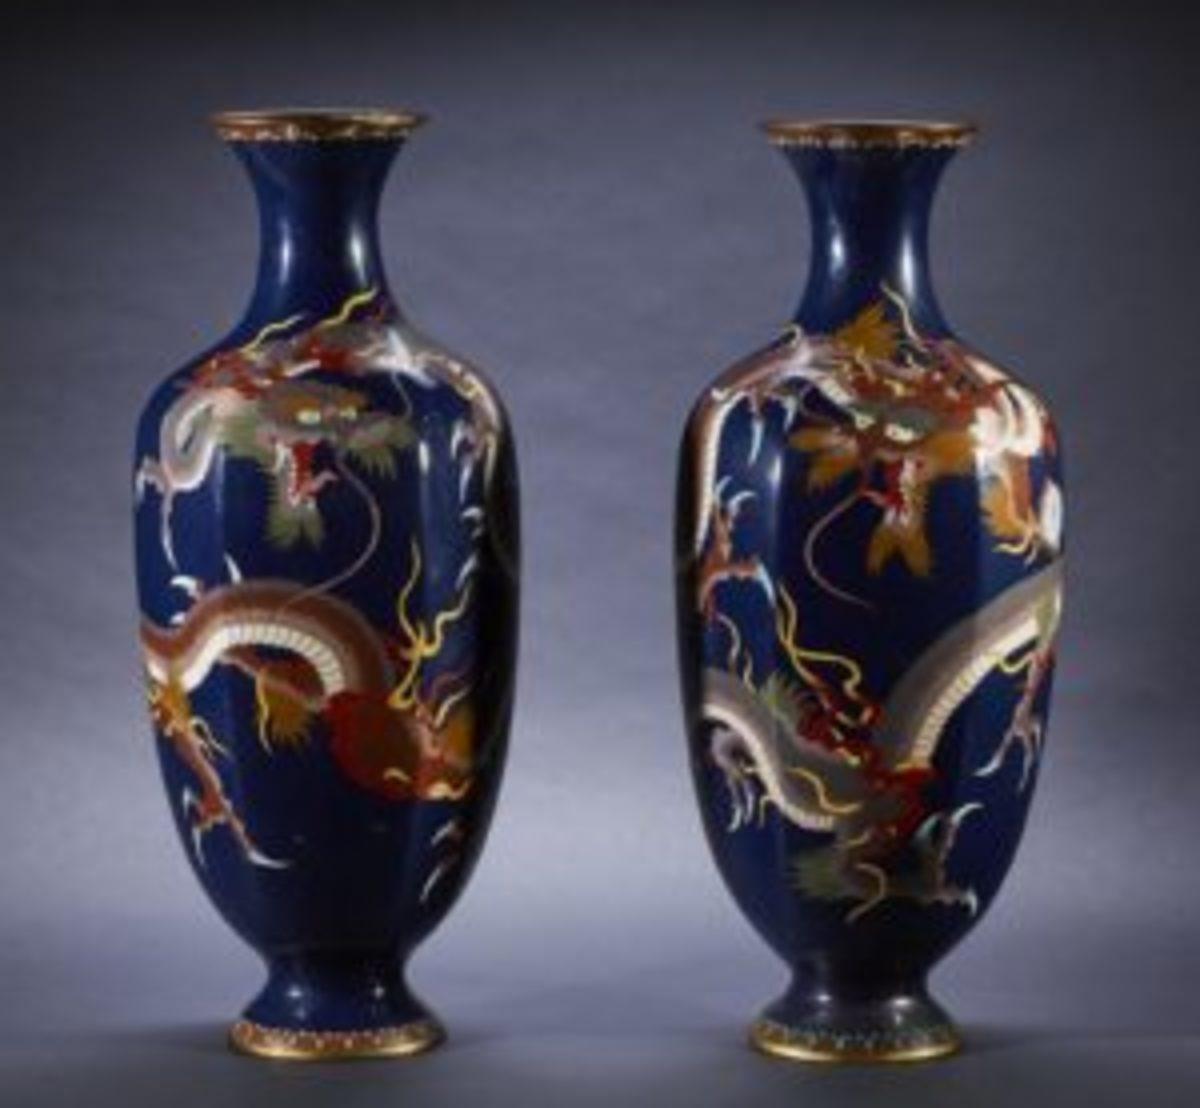 Meiji period vases